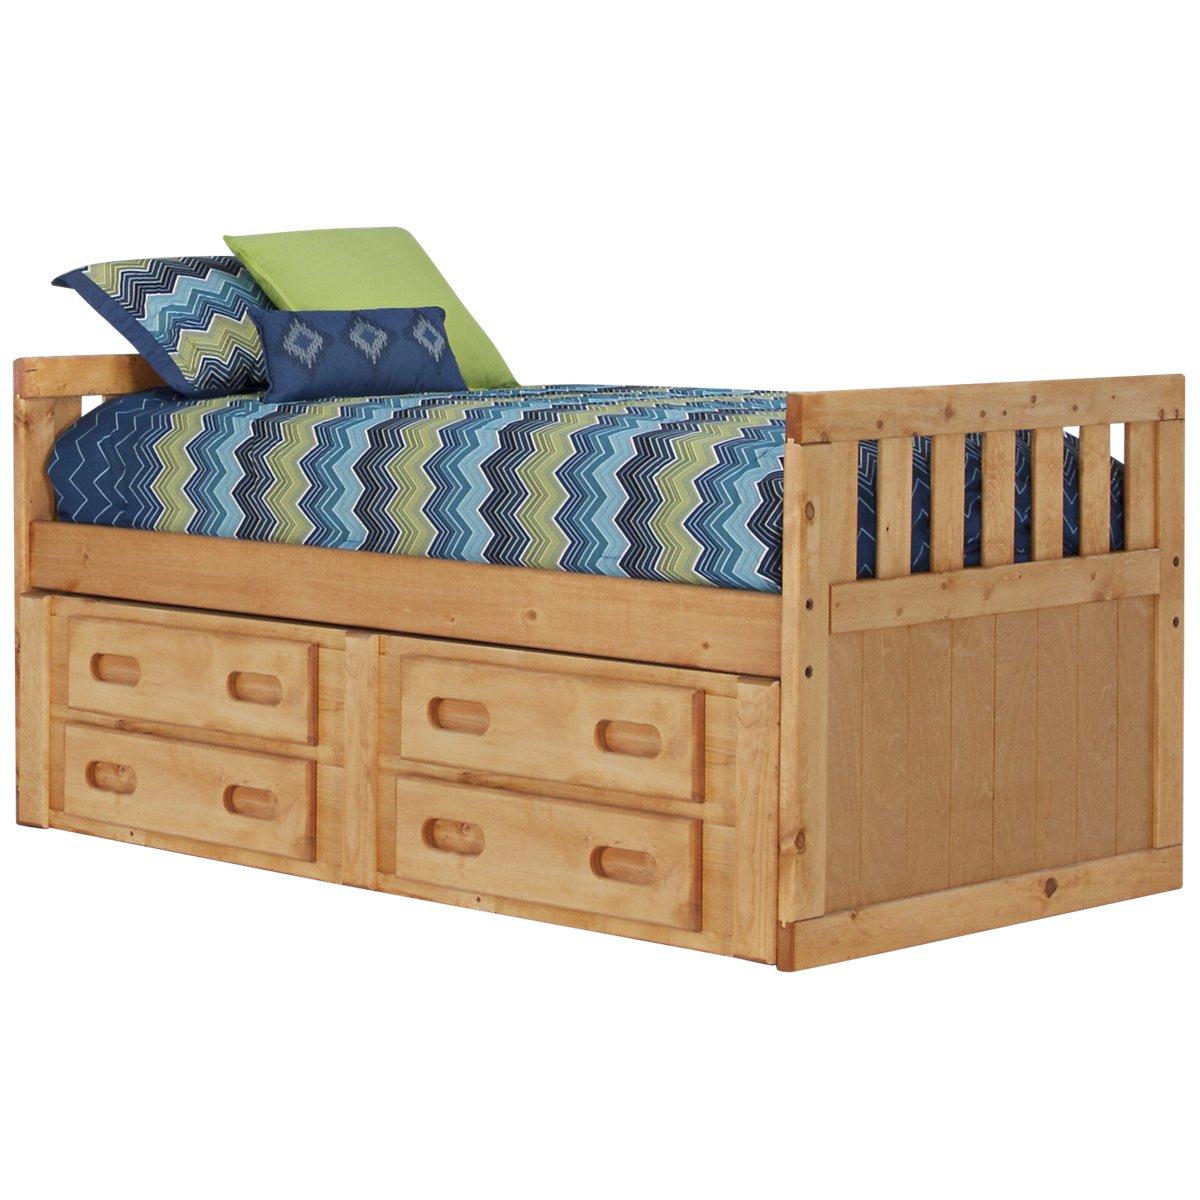 Cinnamon2 Mid Tone Panel Storage Bed